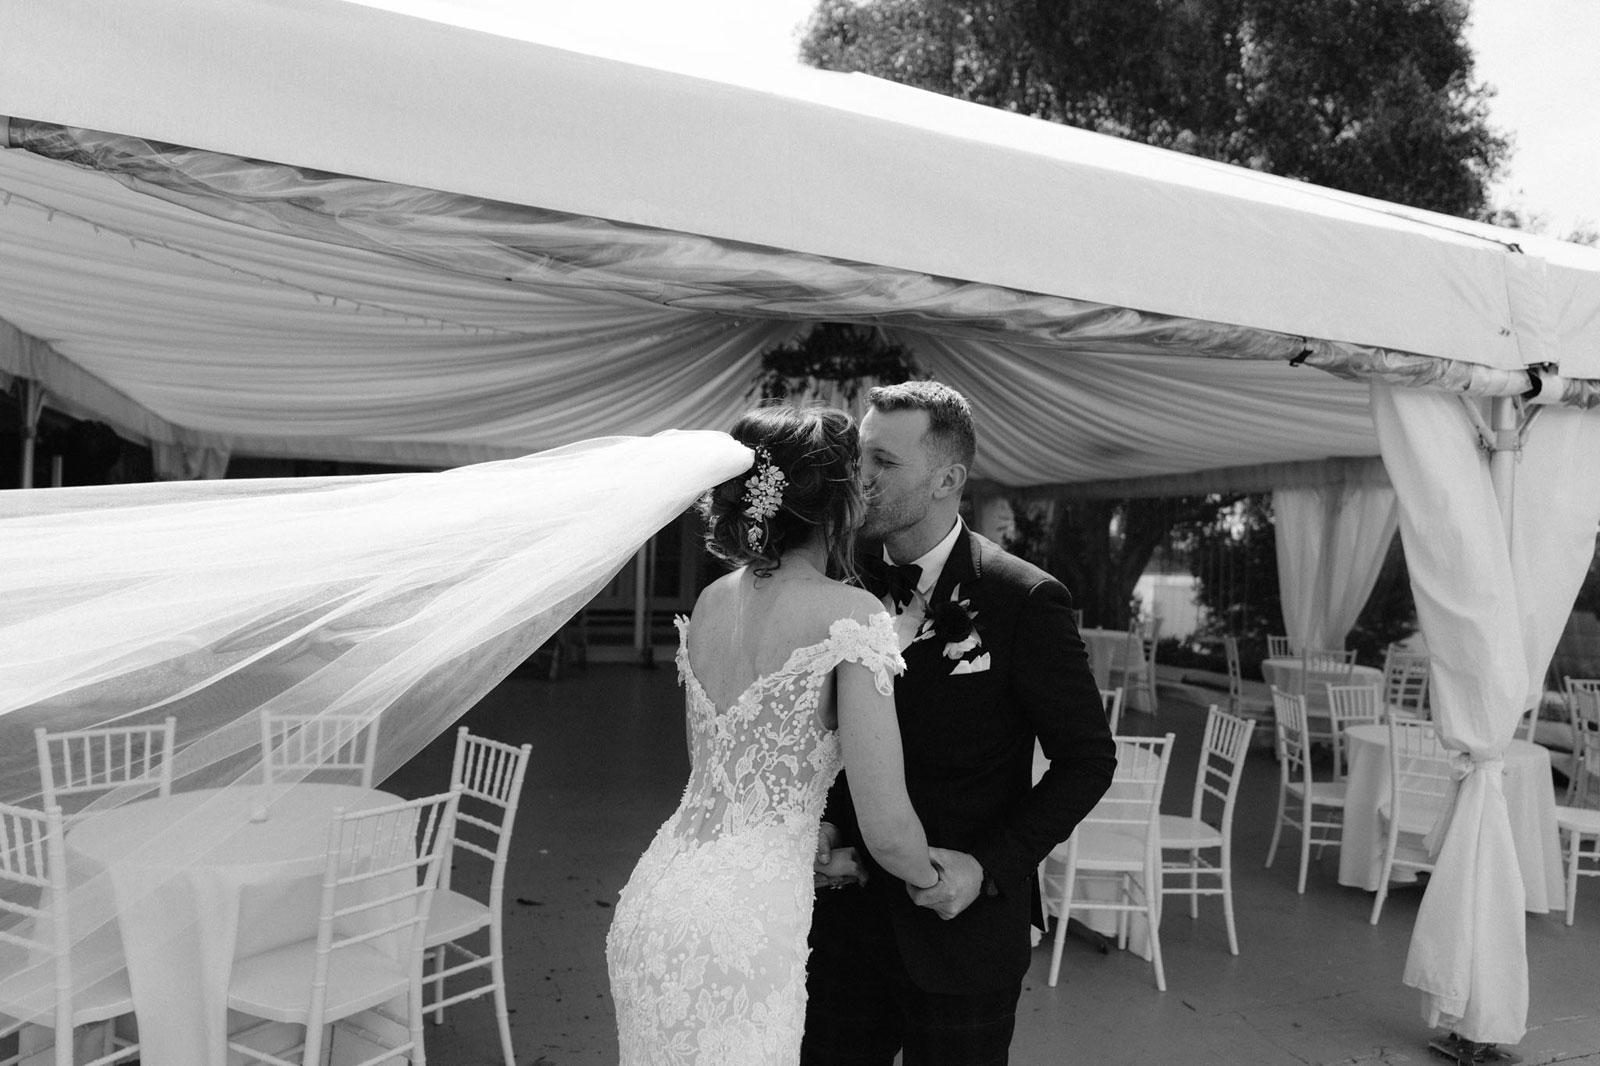 newfound-n-c-olive-tree-cottage-tauranga-wedding-photographer-495A